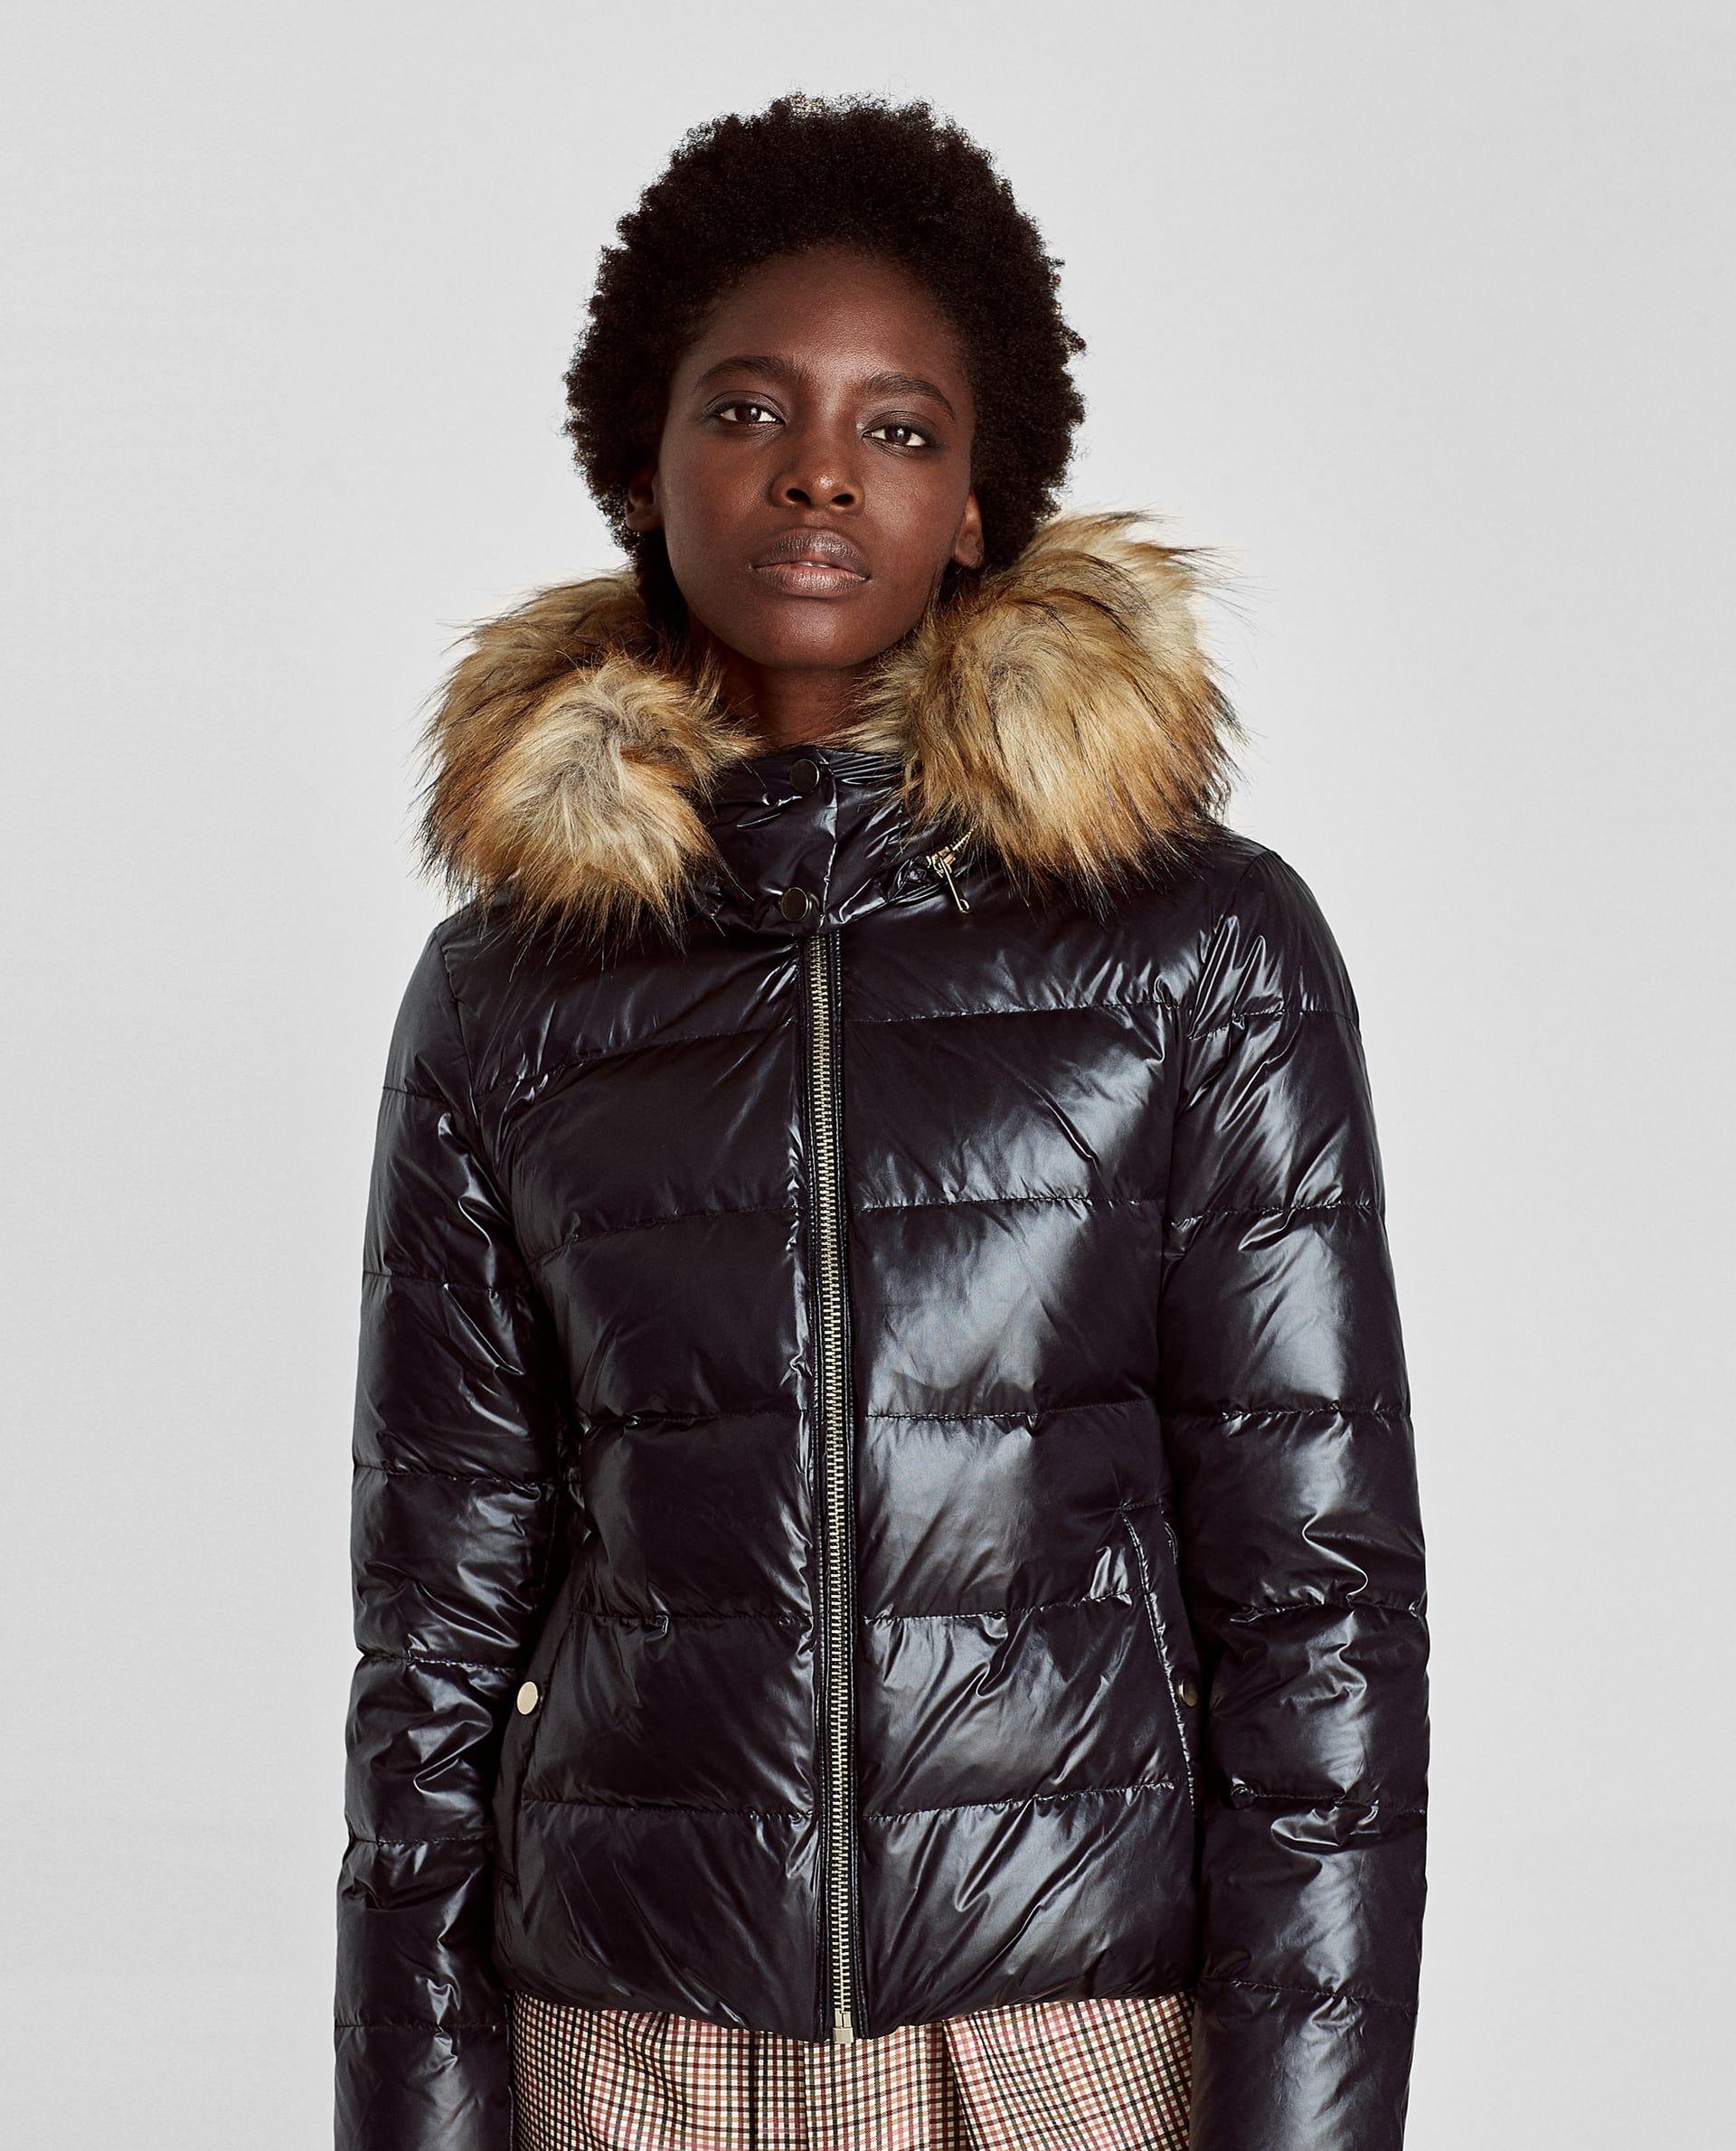 Shiny Down Puffer Jacket Shiny Down Puffer Jacket Details 7 990 Rsd 5 990 Rsd Color Black 0518 262 Jackets Puffer Jackets Faux Fur Hood [ 2379 x 1920 Pixel ]